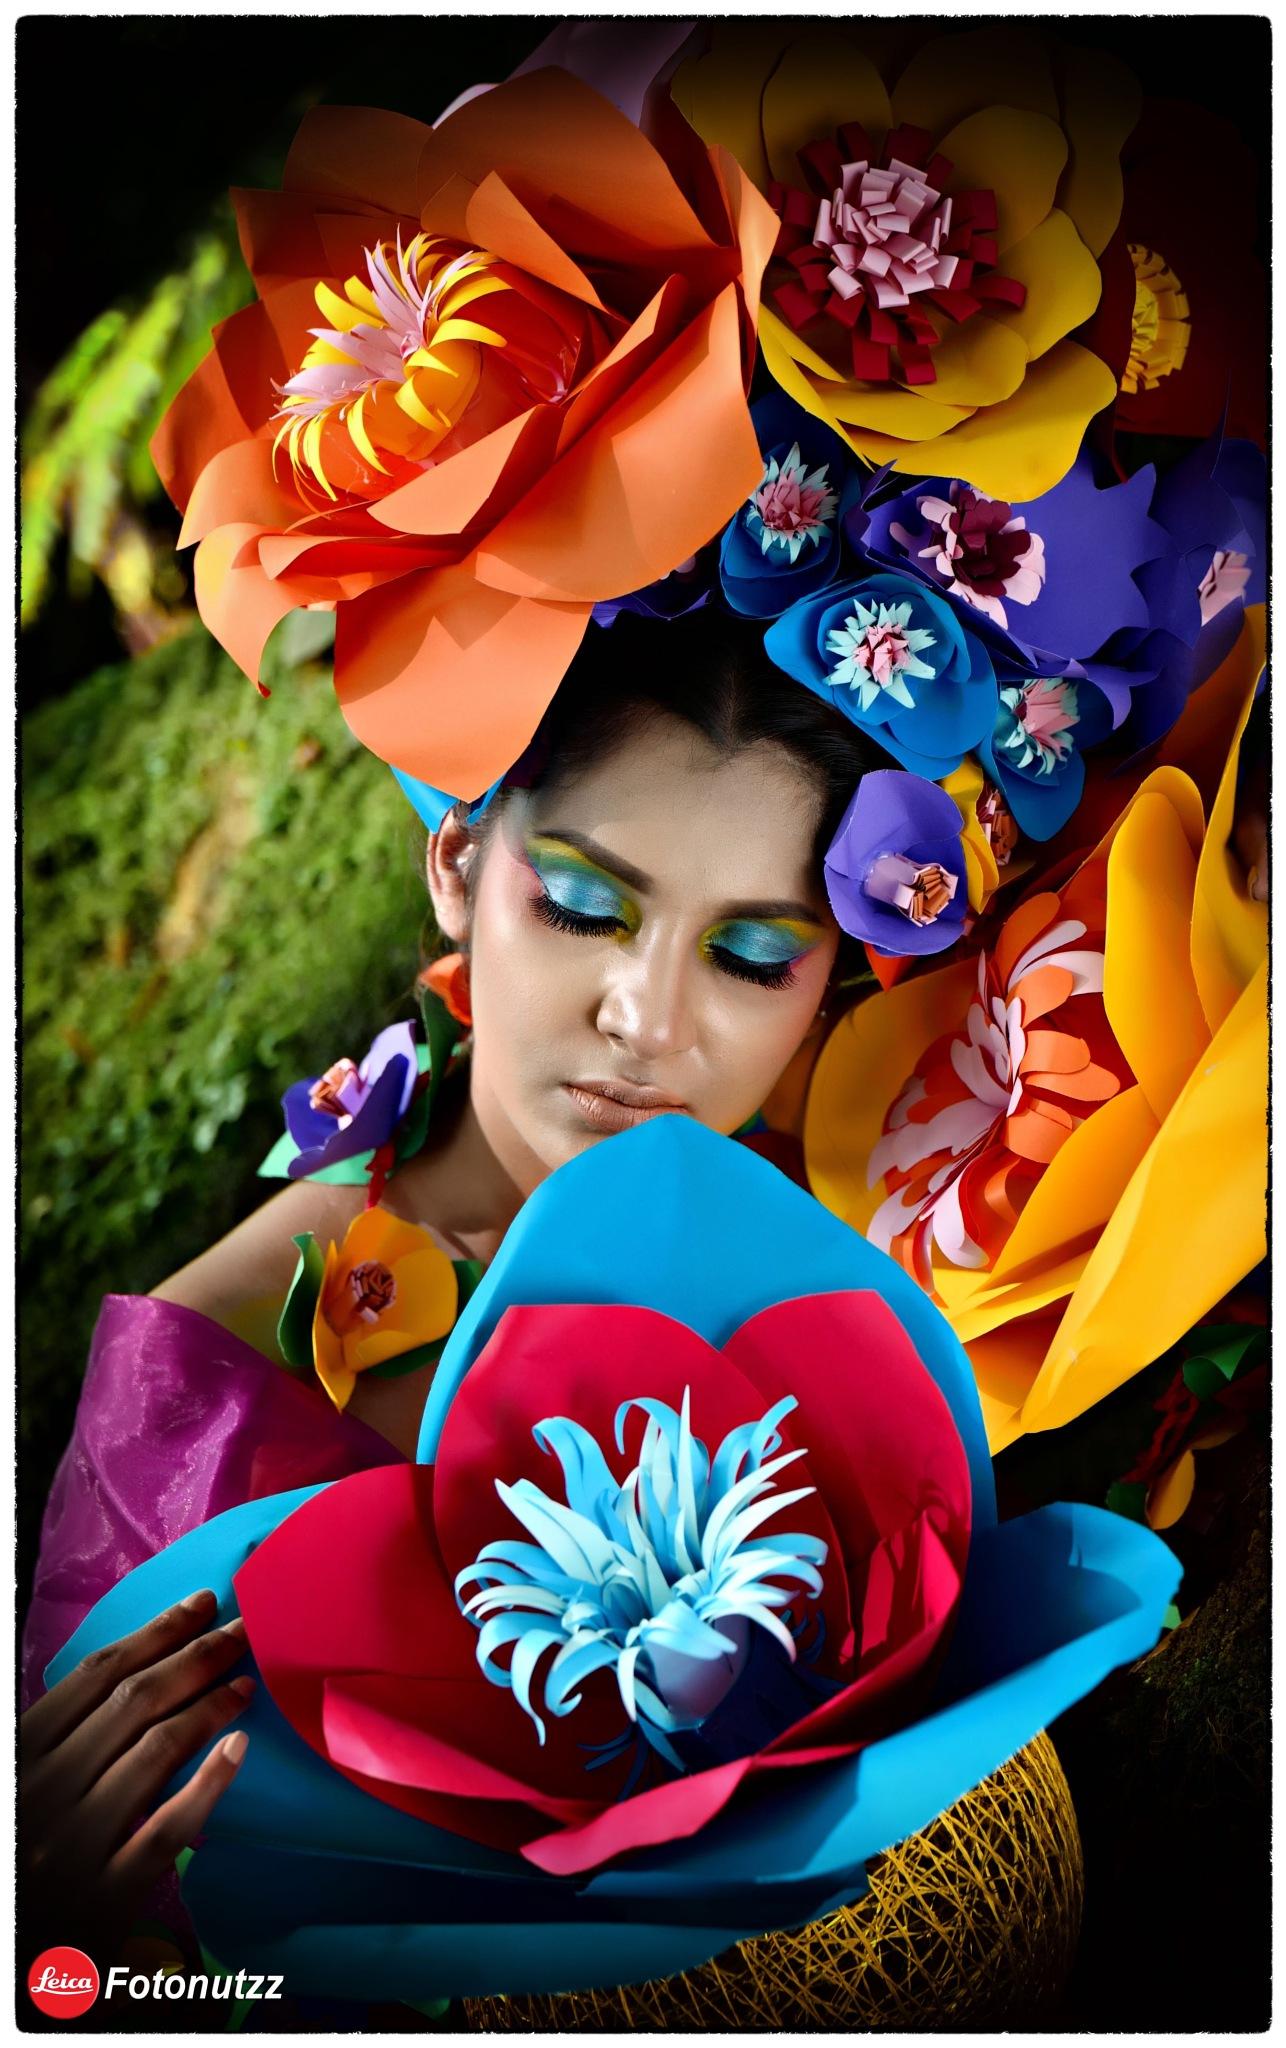 Paper flowers by Fotonutzz